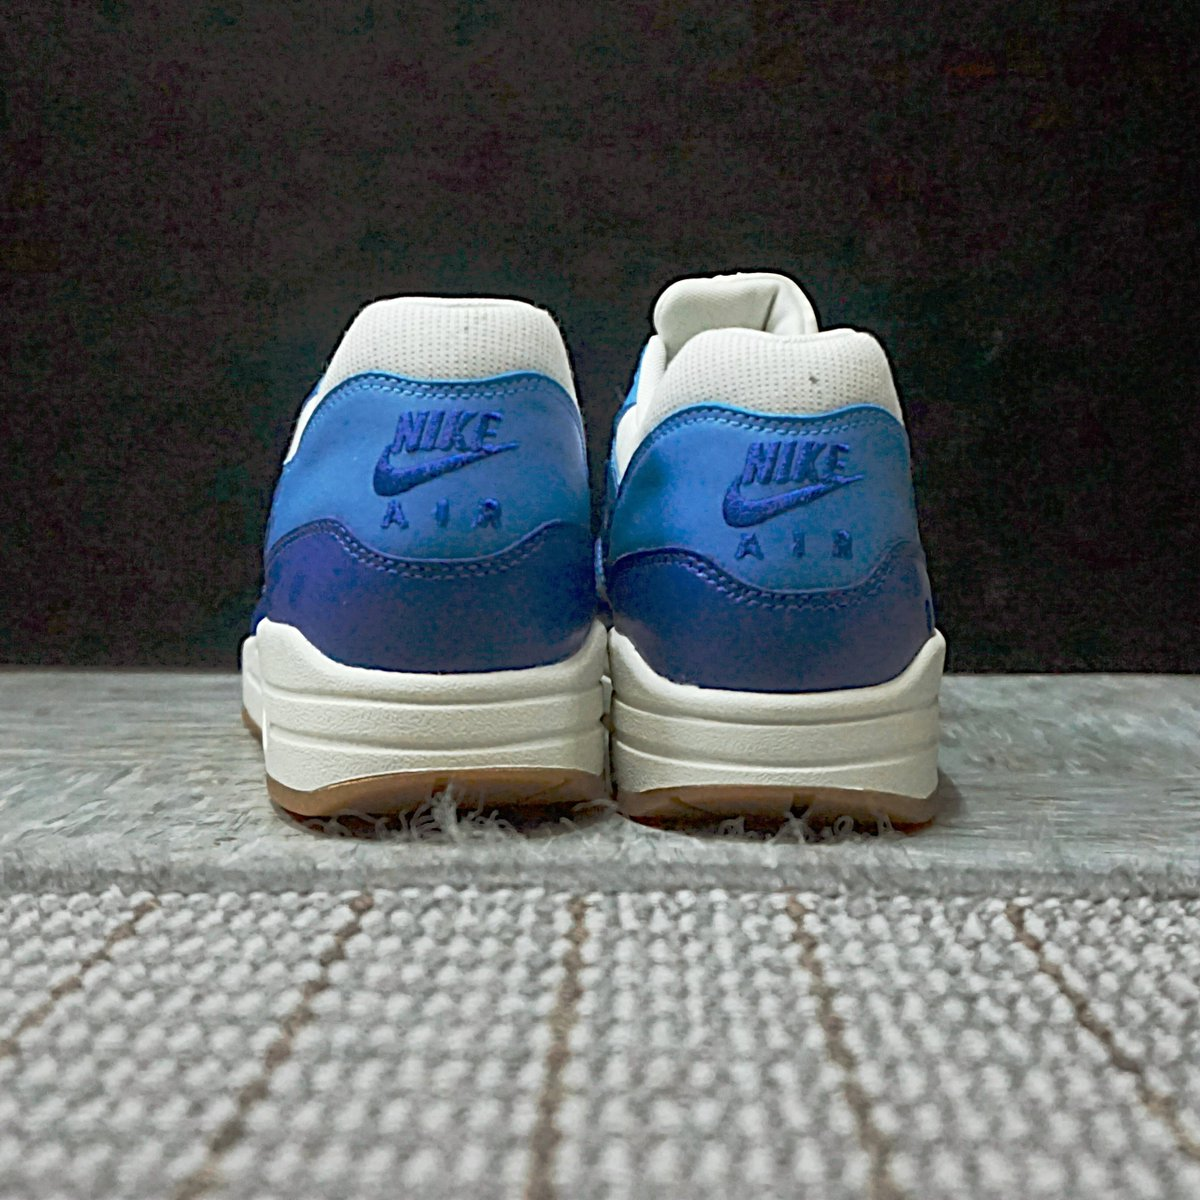 e622656c87 Nike Wmns Air Max 1 (555284-105)  https://www.kicks-crew.com/detail/2602/Nike-Wmns-Air-Max-1-VNTG/Hyper-Blue- Lightning/555284-105/ …pic.twitter.com/ ...